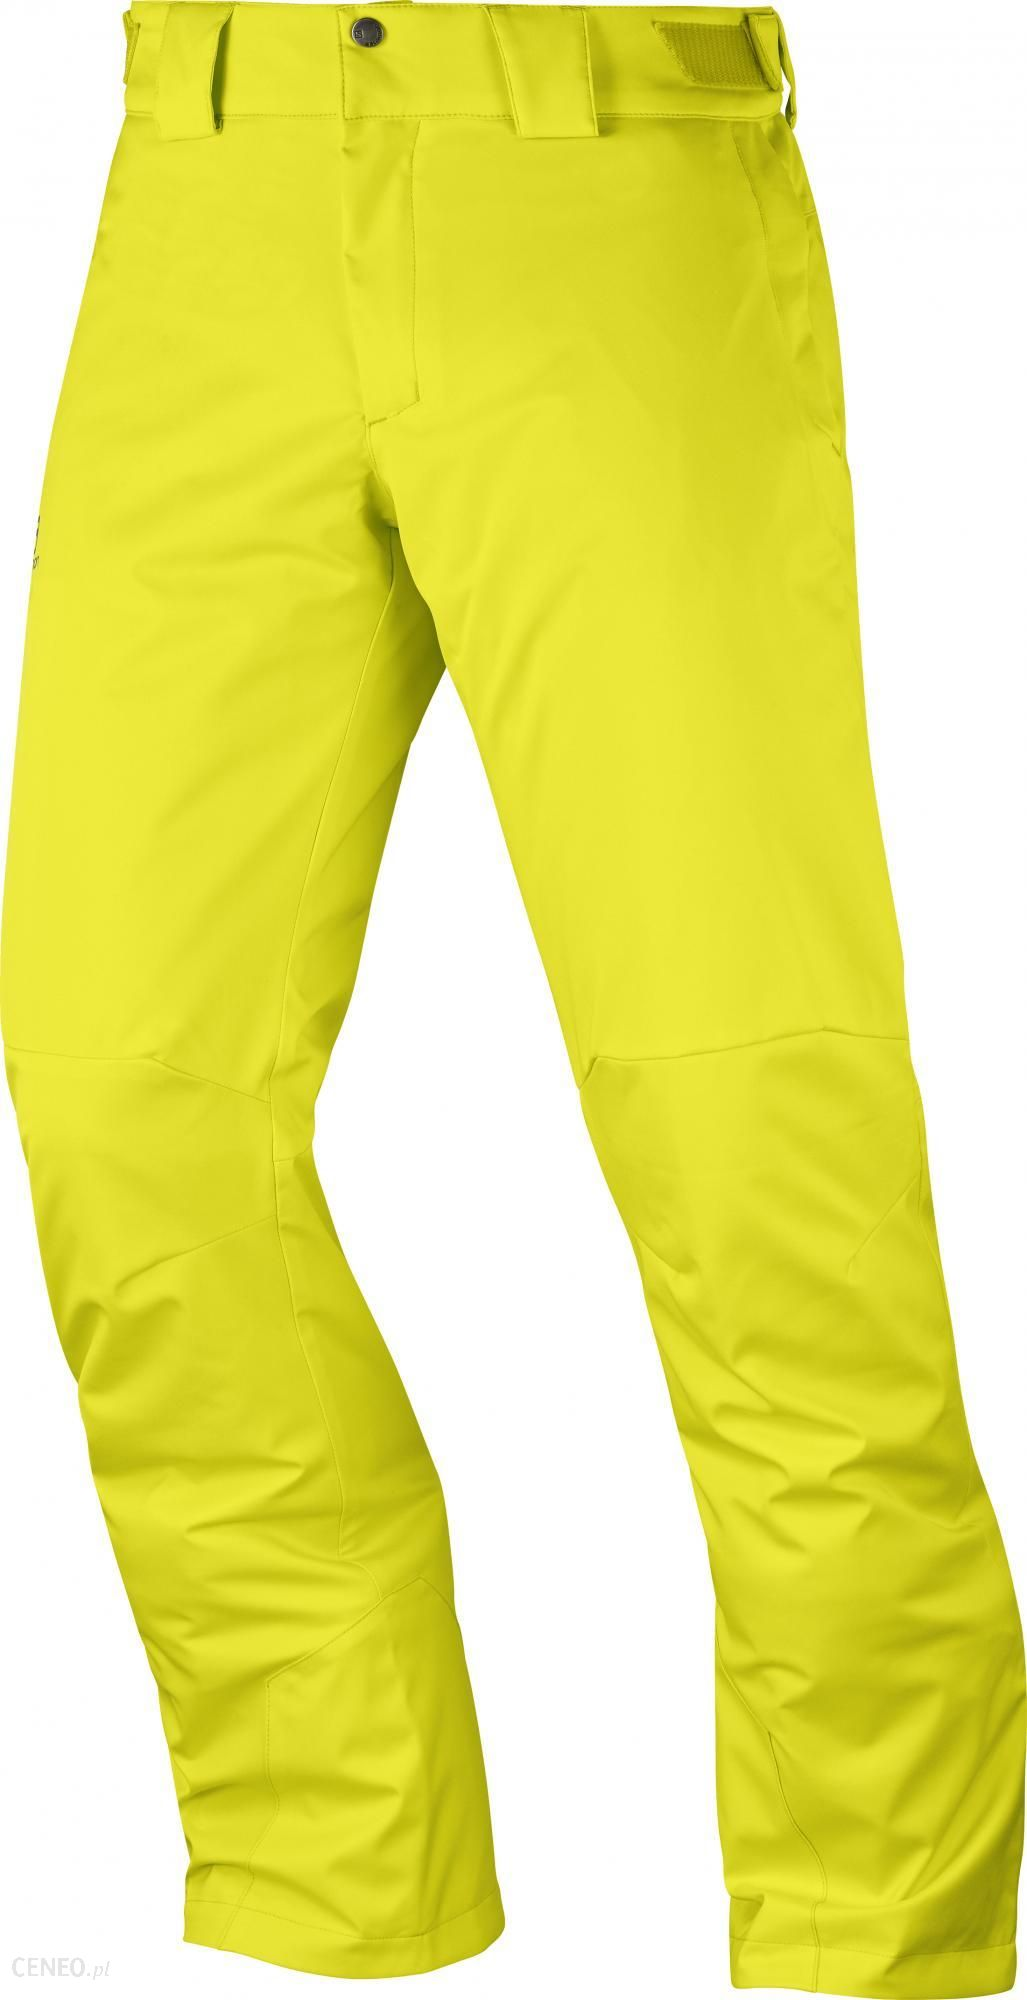 b178a5cdffab52 Salomon Męskie Spodnie Narciarskie Stormpunch Pant M Sulphur Spring -  zdjęcie 1